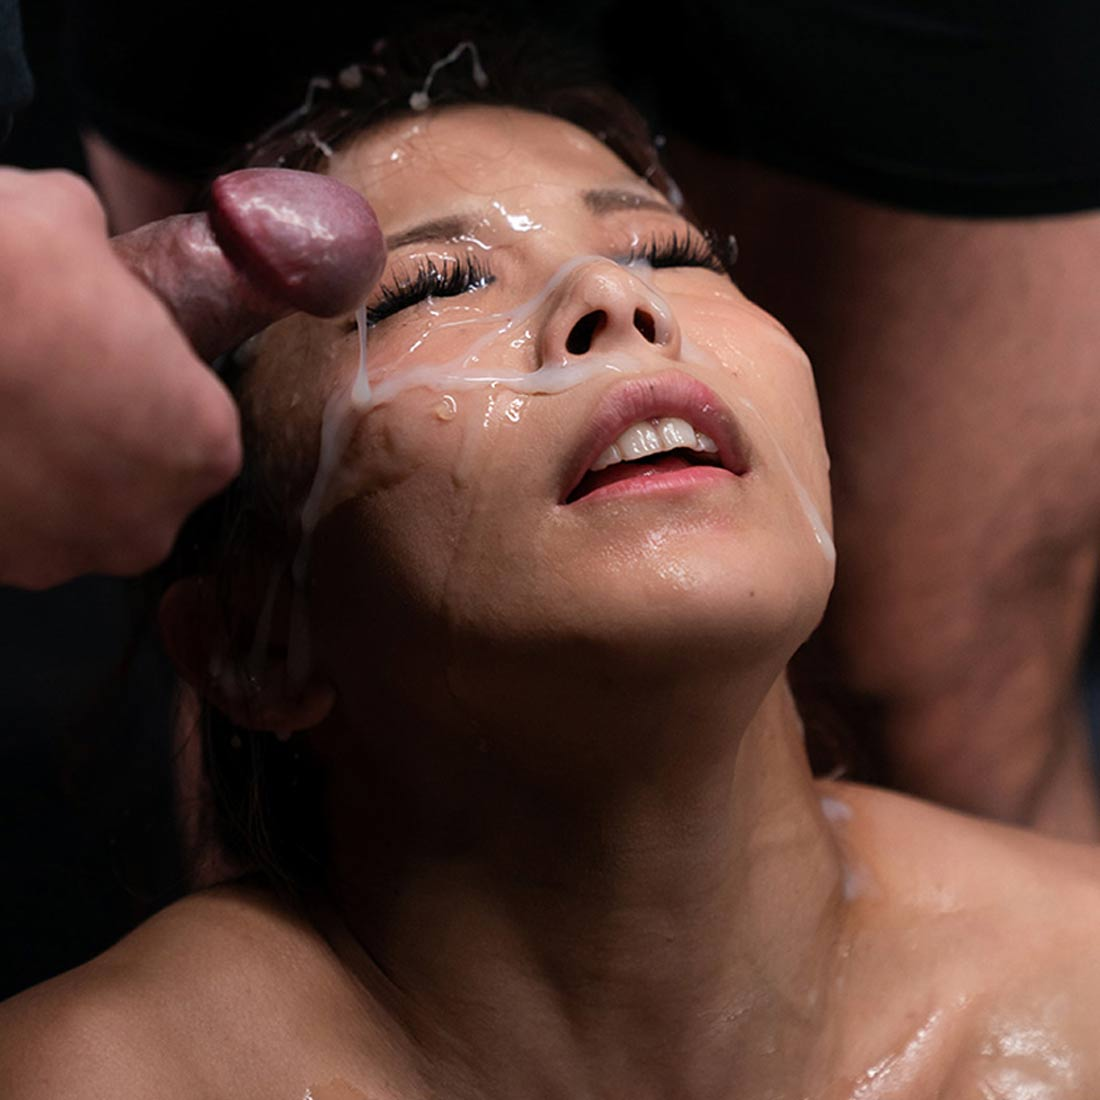 Saki Kawanami's Sticky Bukkake Facial. SpermMania video with one nude girl and 18 cumshots. Uncensored Cum Fetish.